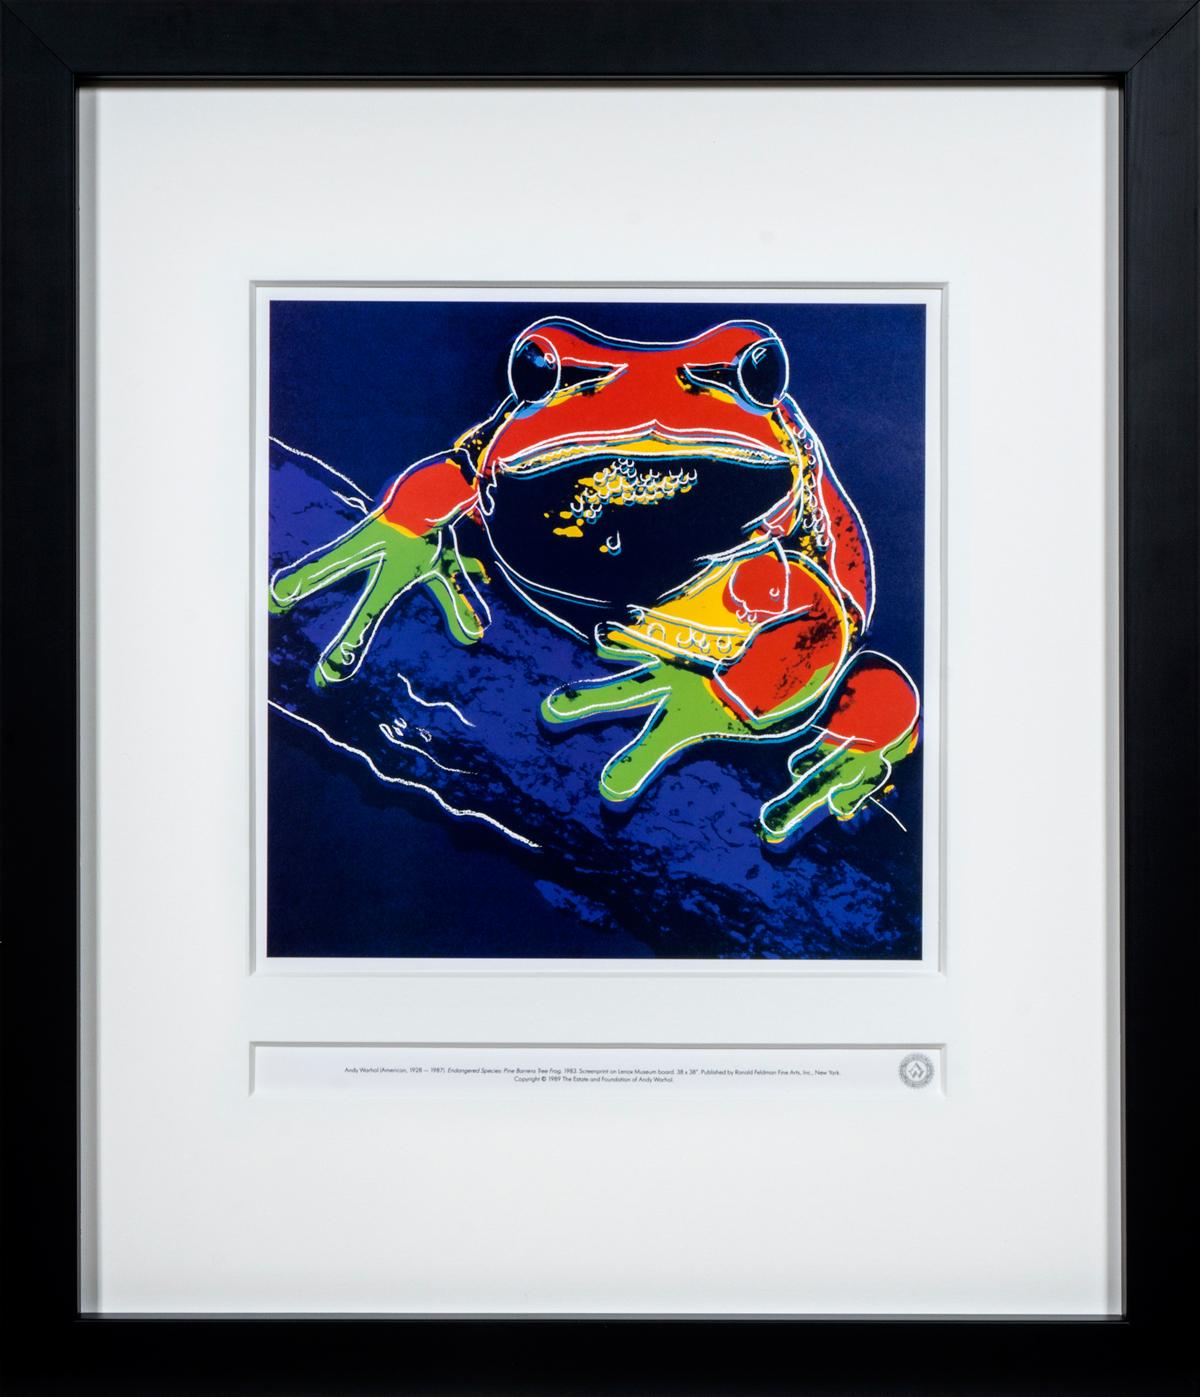 Pine Barrens Tree Frog in frame